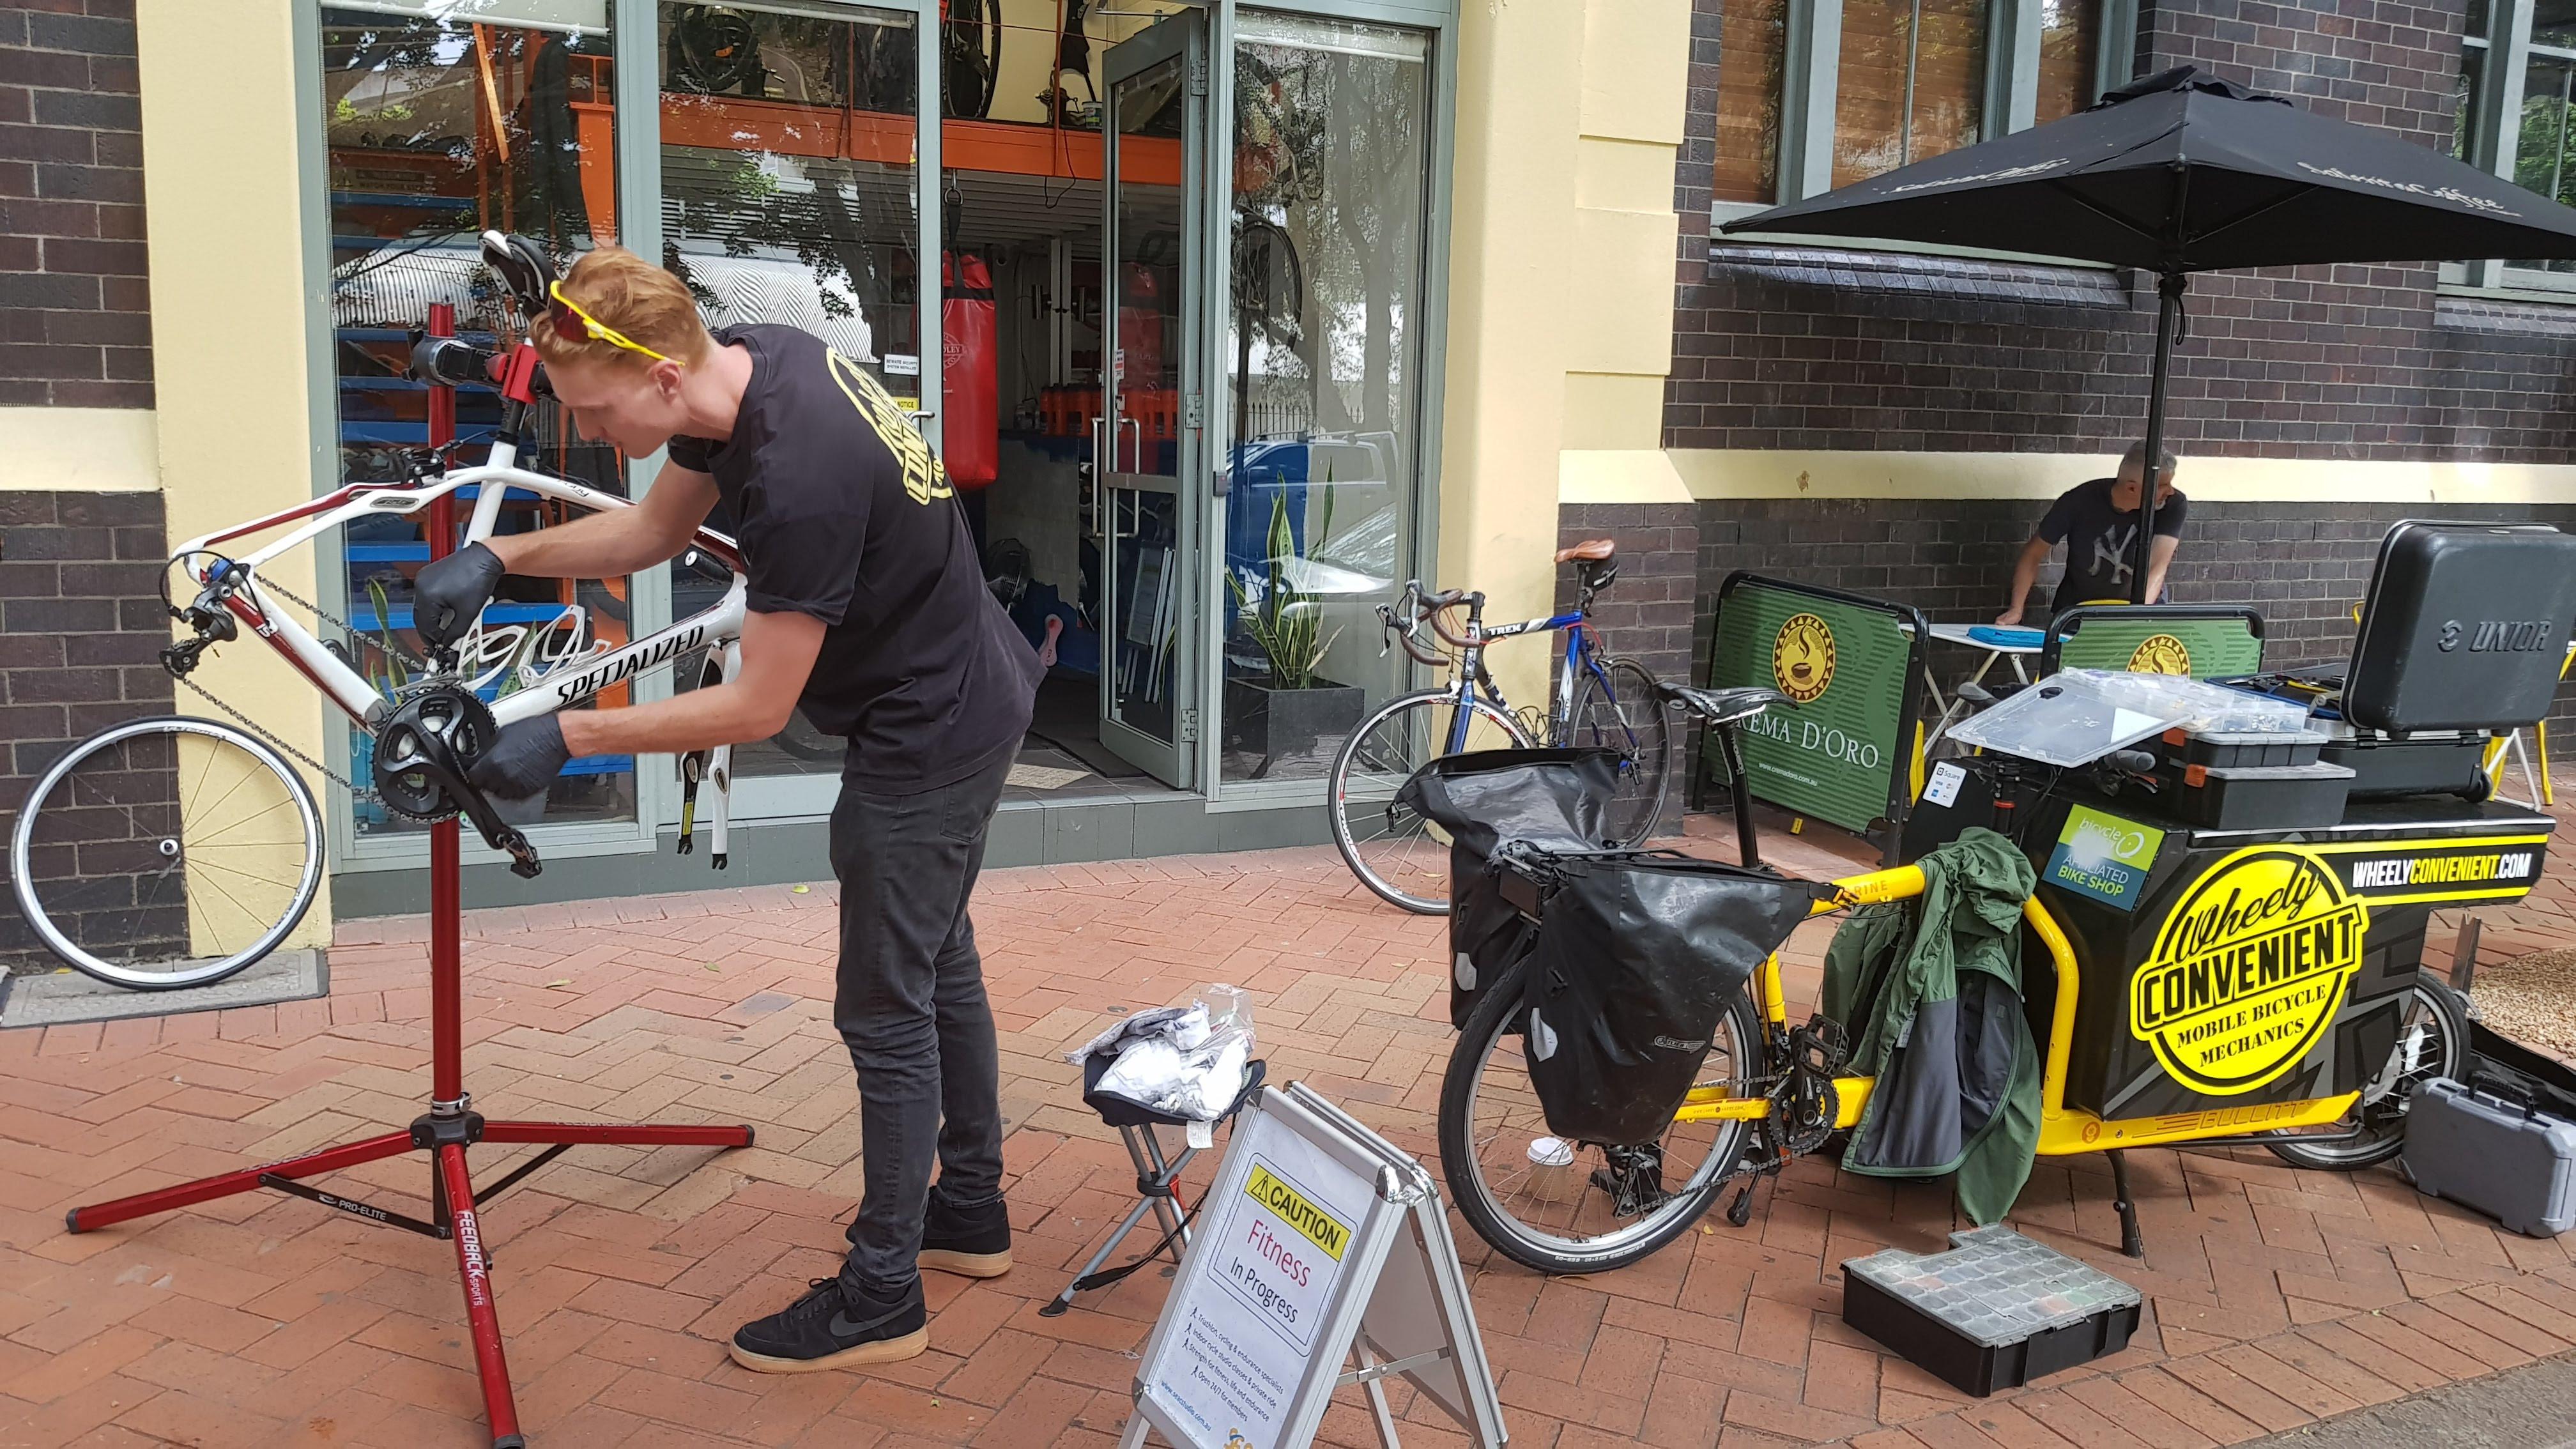 Wheely Convenient Basic Bike Service